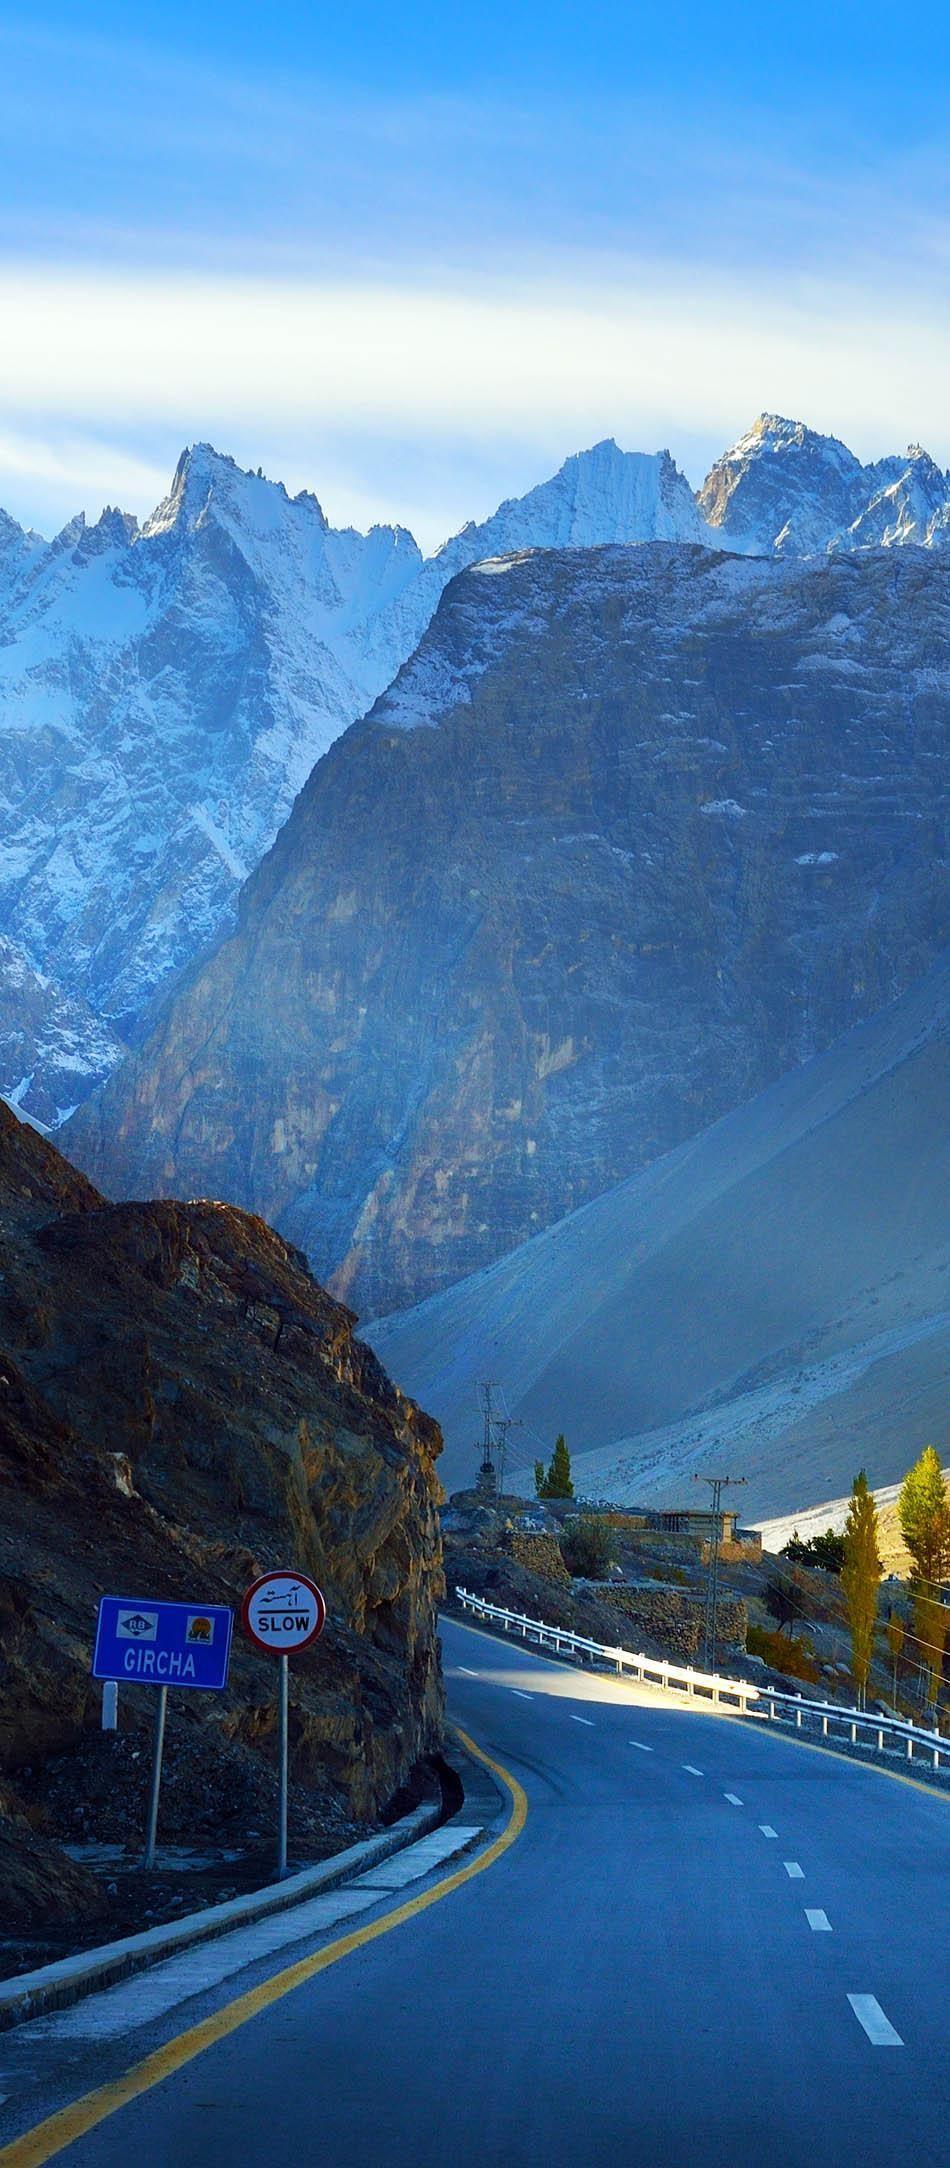 Karakorum highway. Autumn season in Northern Pakistan.   23 Roads you Have to Drive in Your Lifetime